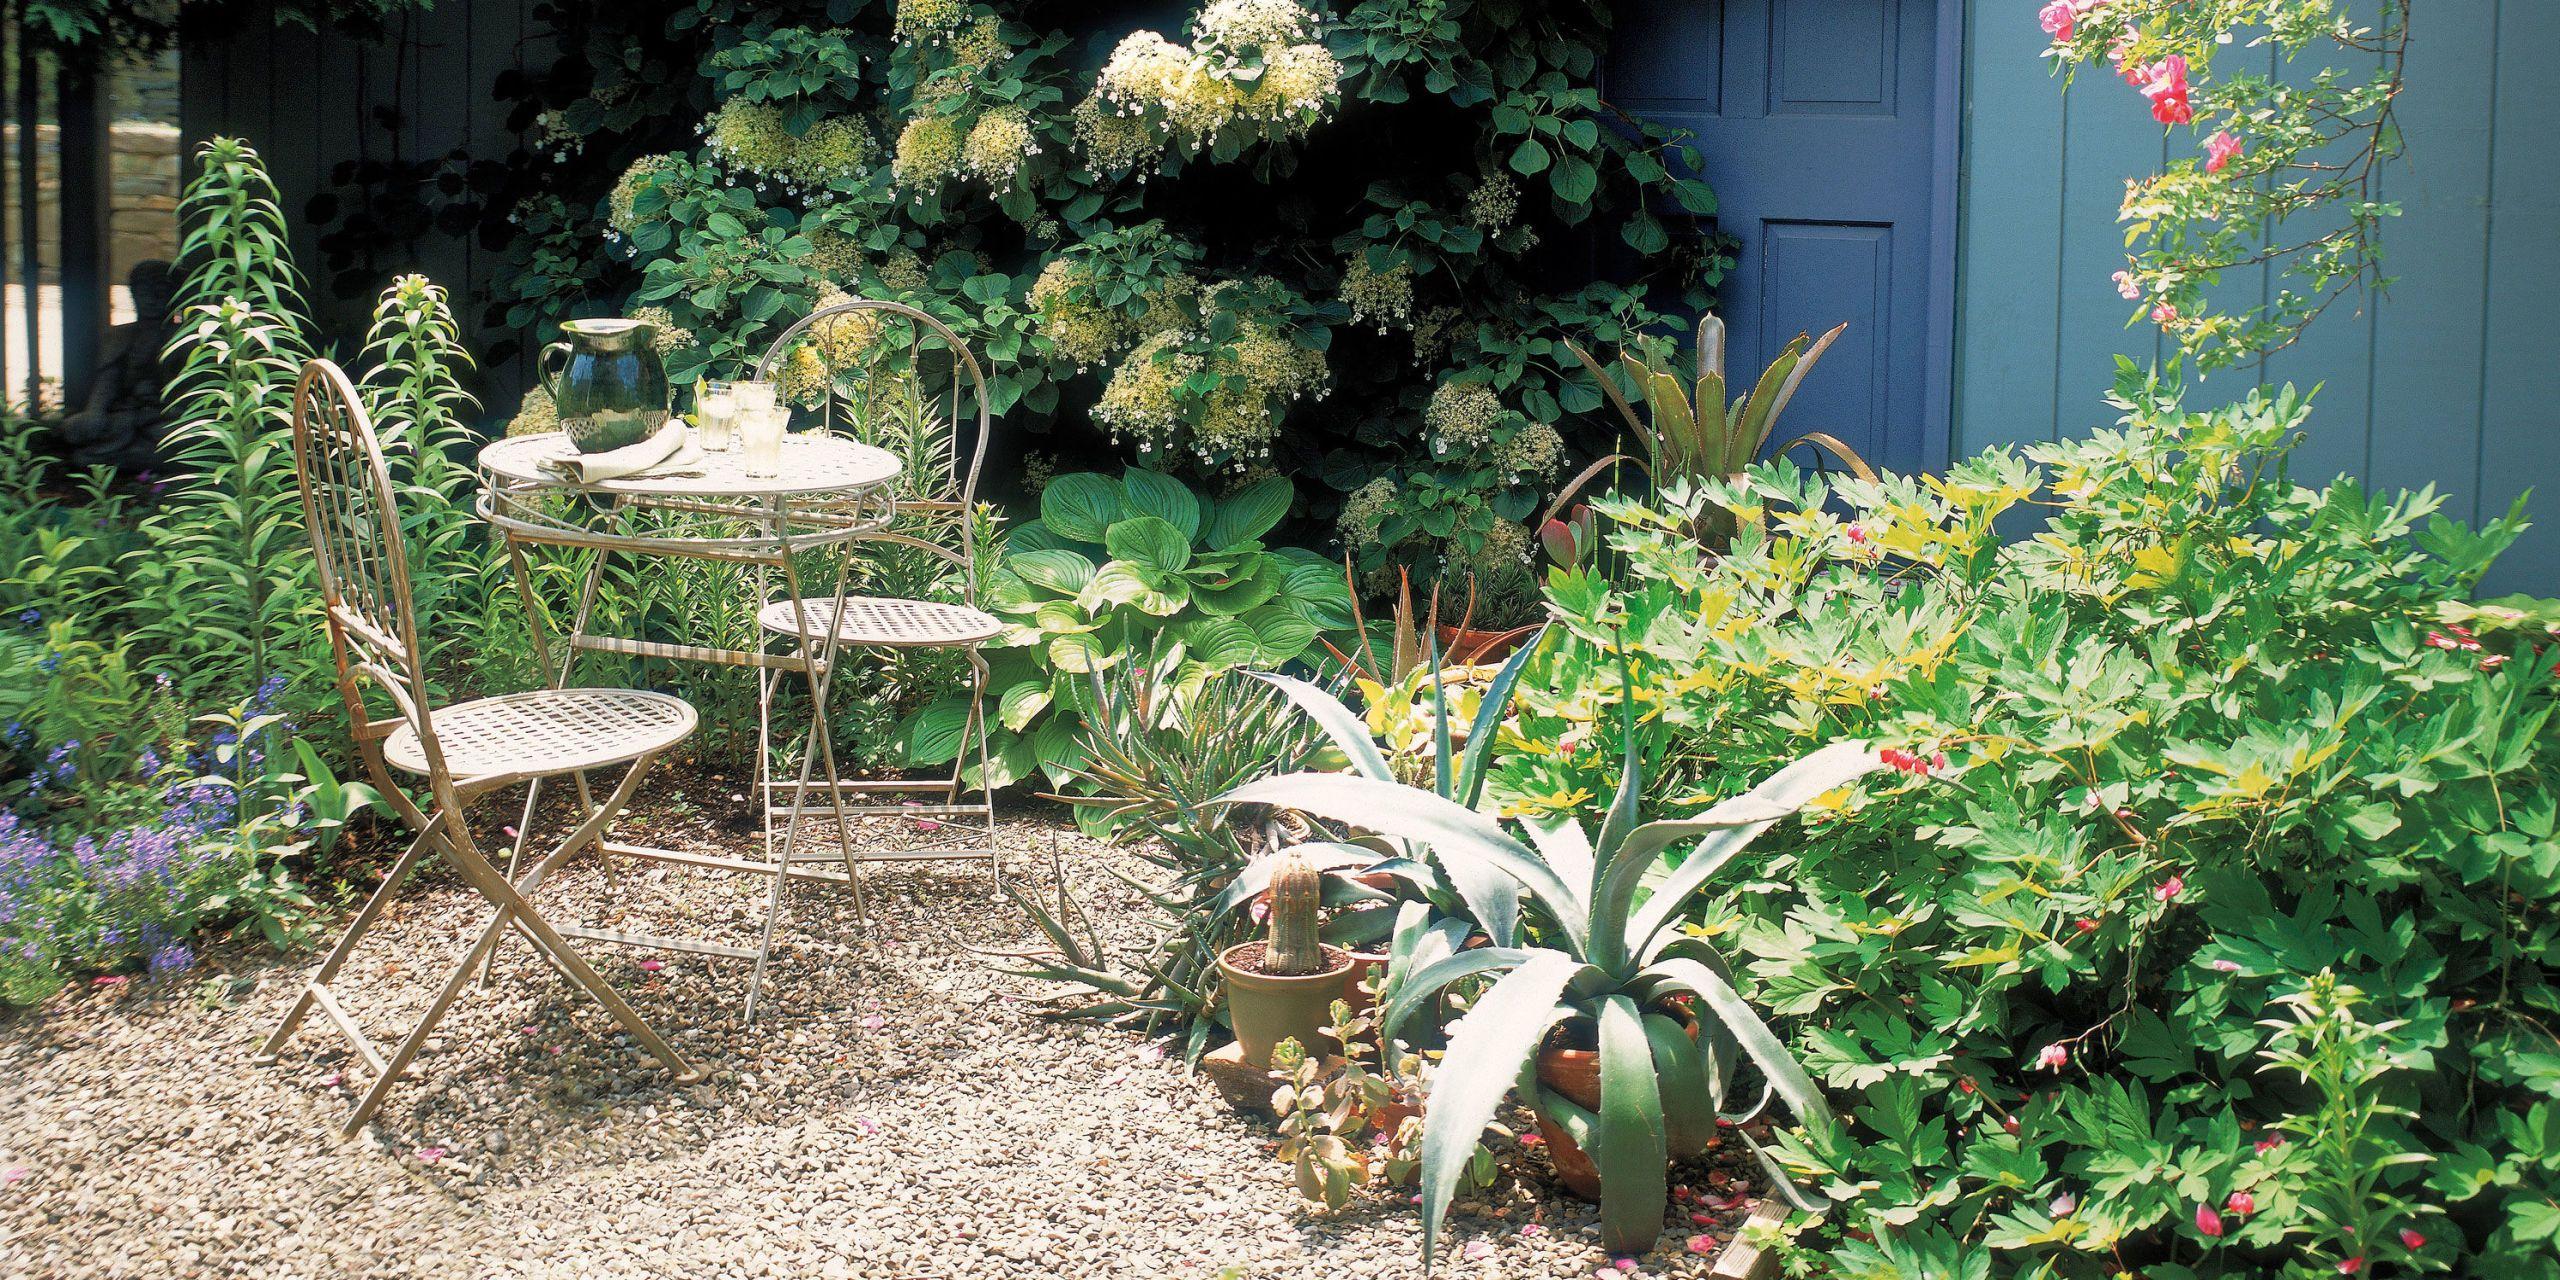 cheap landscaping ideas & 14 Cheap Landscaping Ideas - Budget-Friendly Landscape Tips for ...